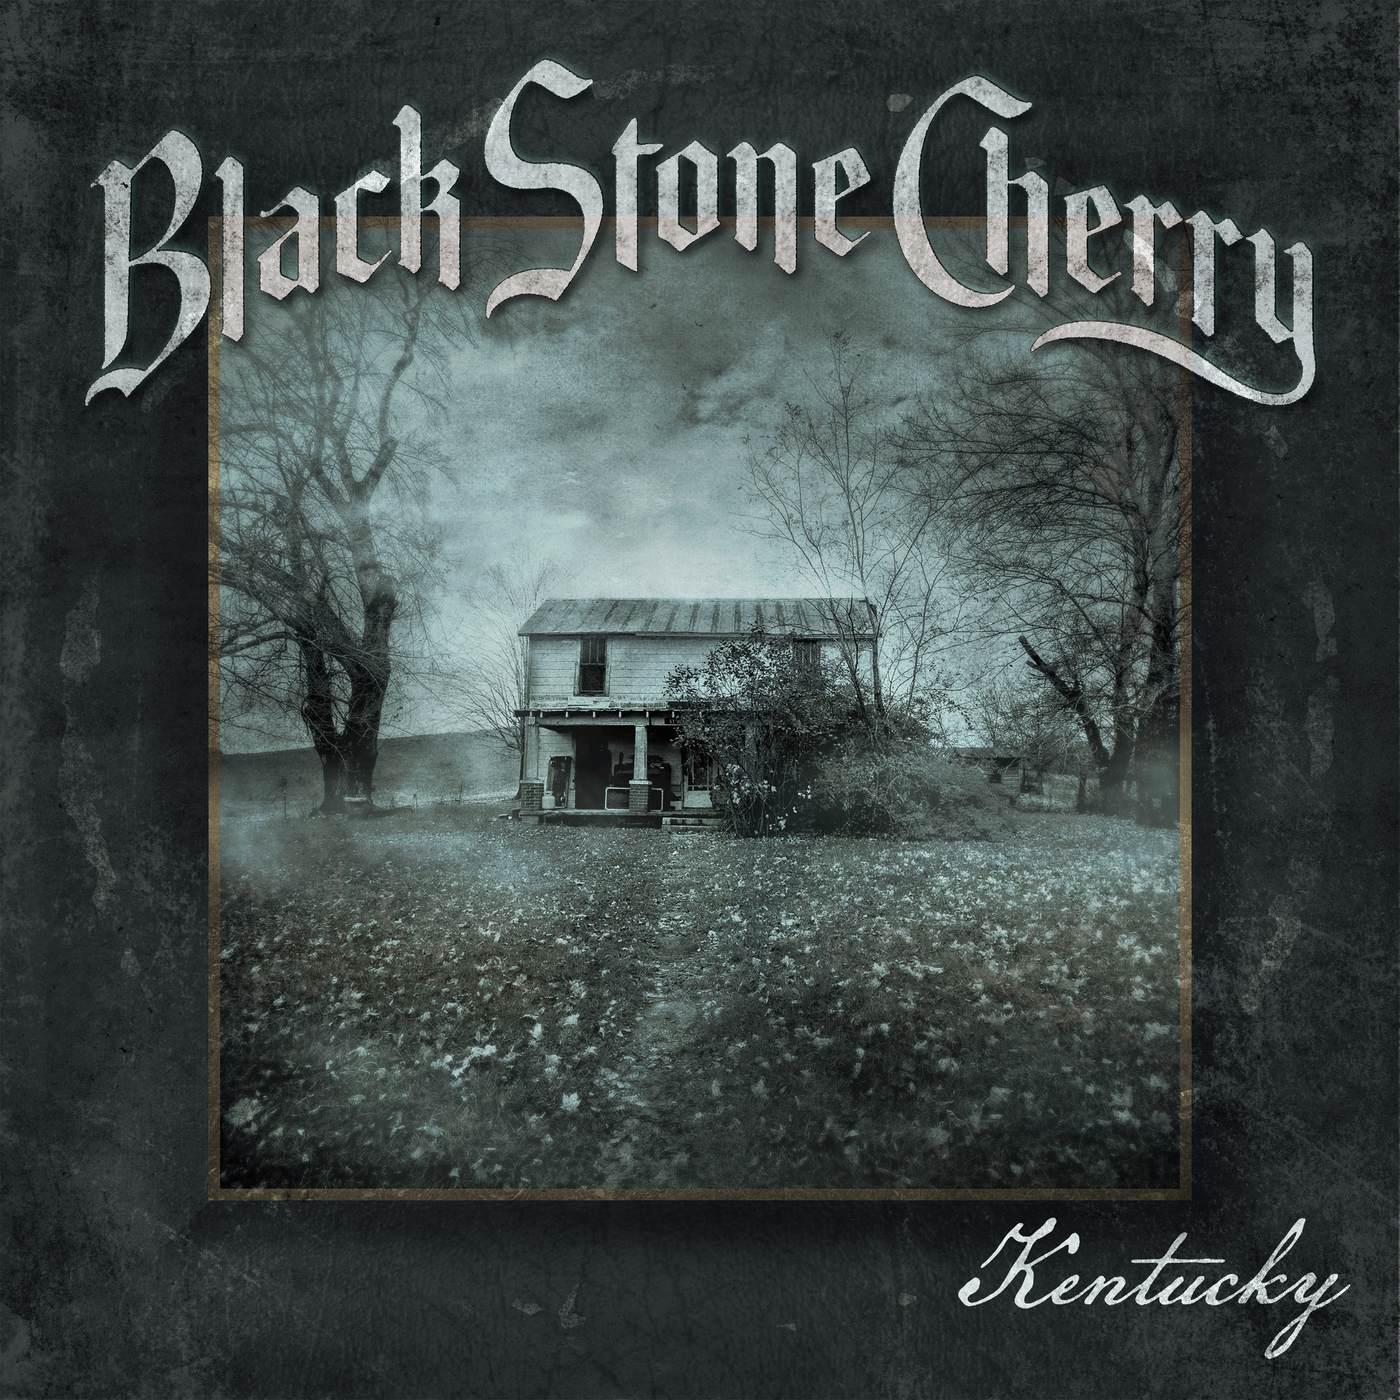 Black Stone Cherry: Kentucky (2016) Book Cover